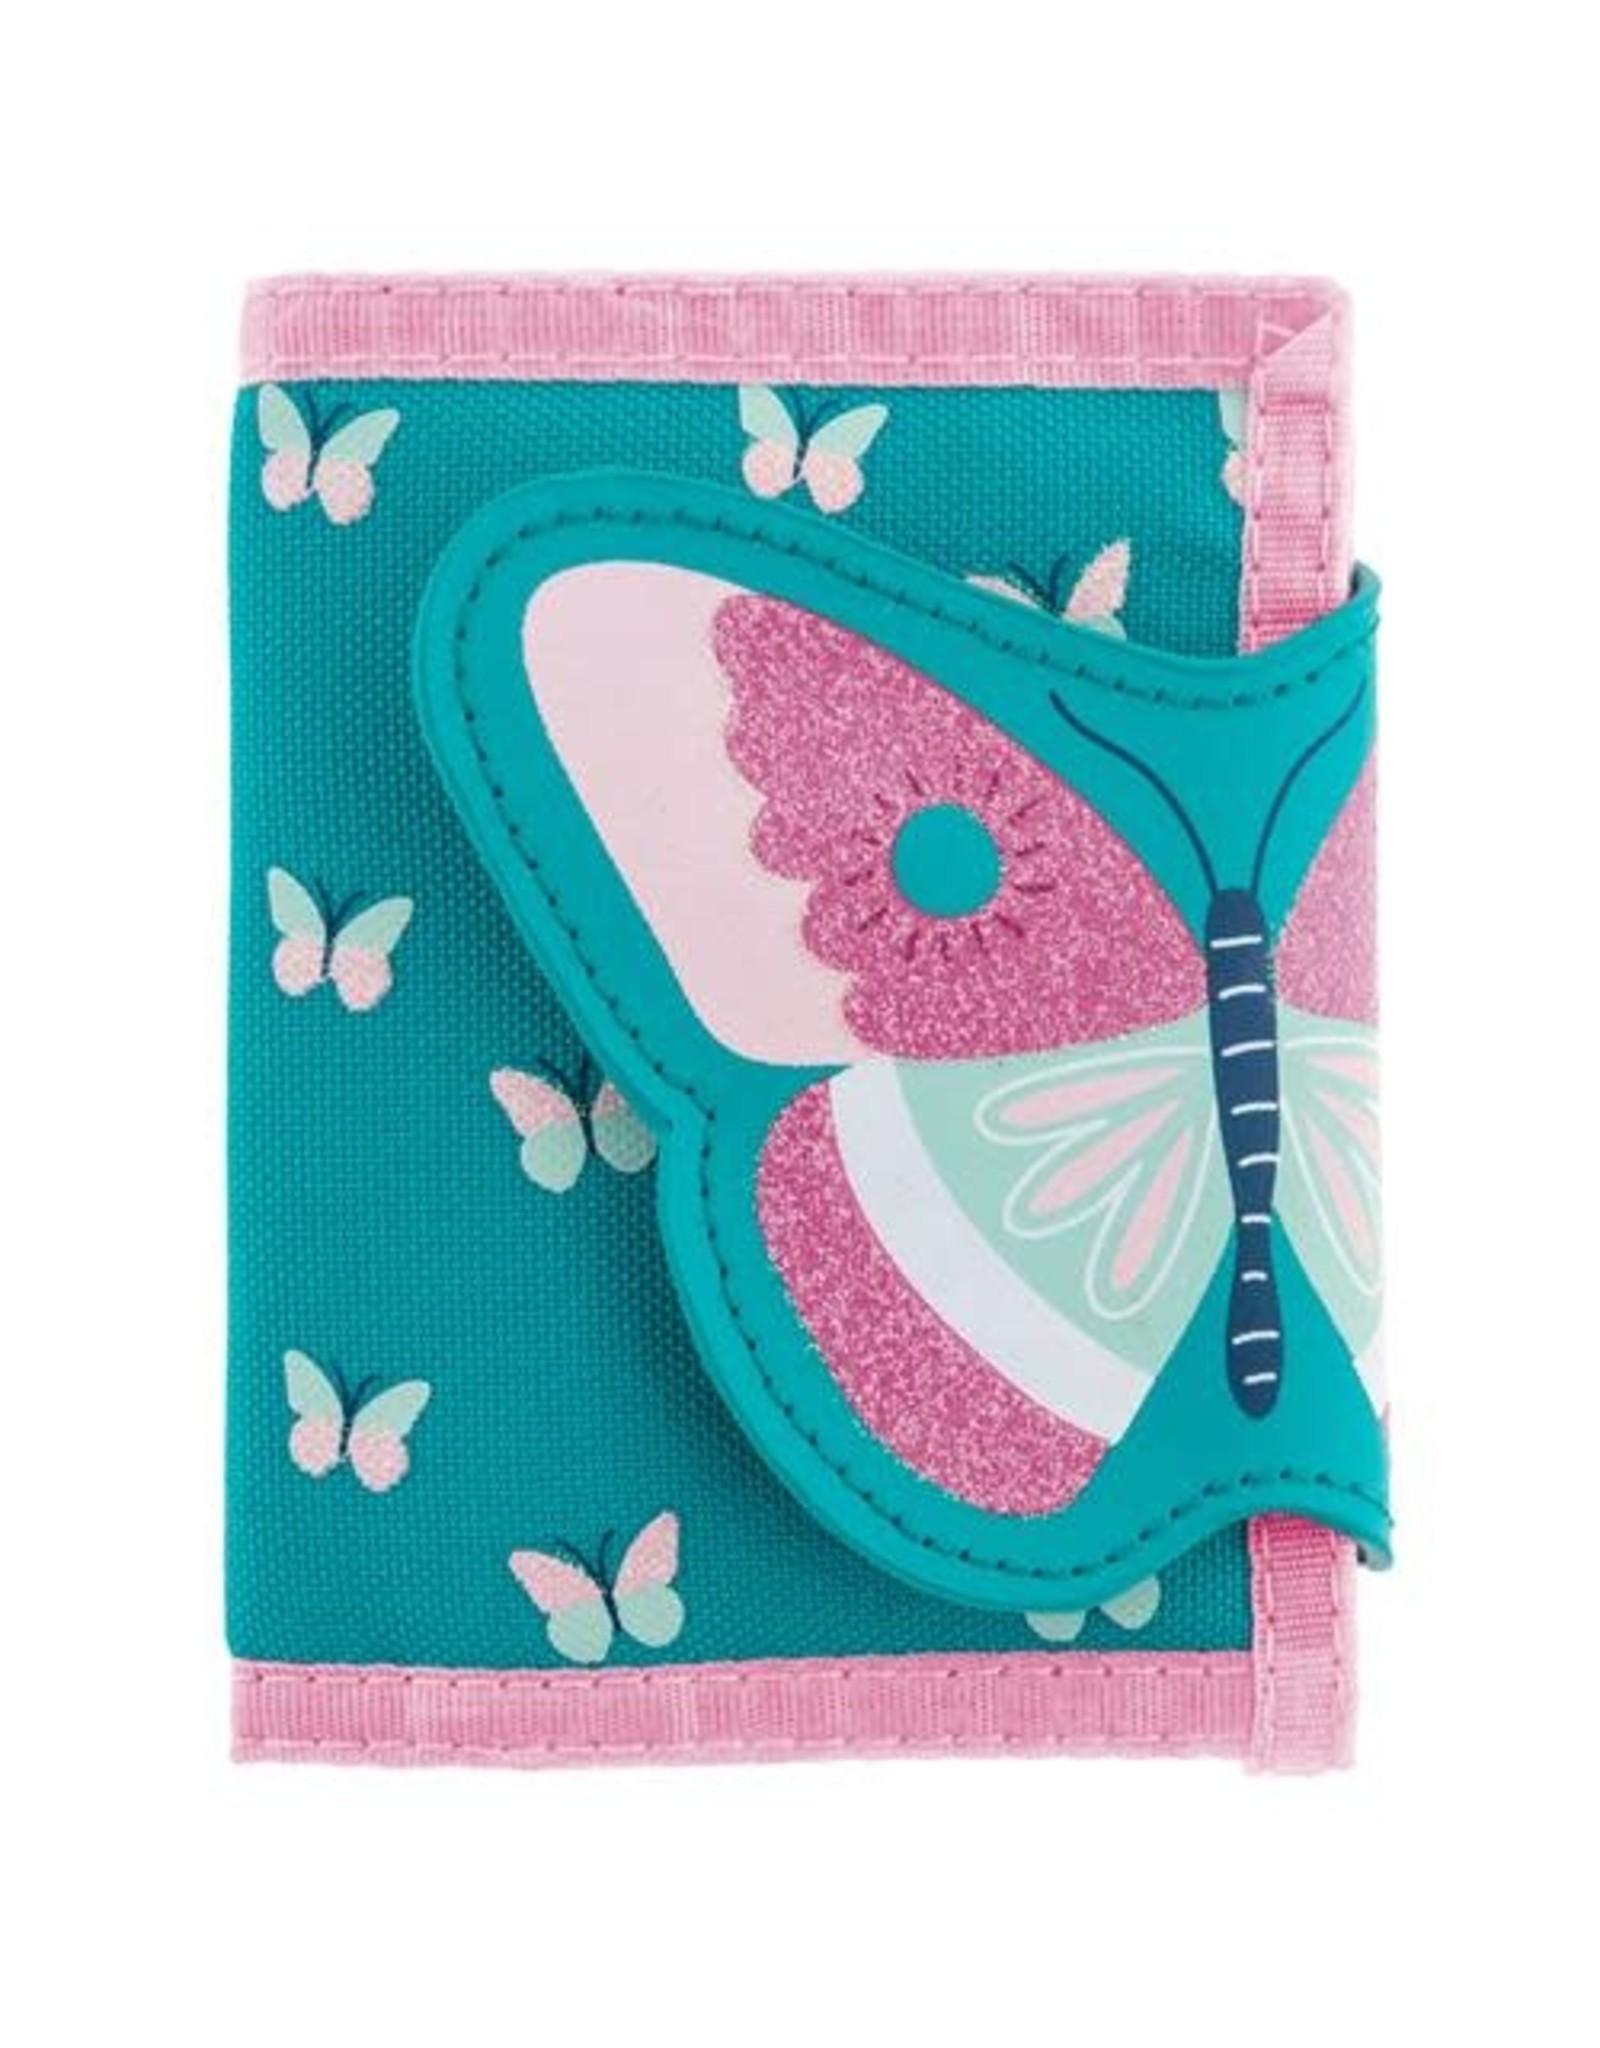 Stephen Joseph Butterfly Floral Wallet